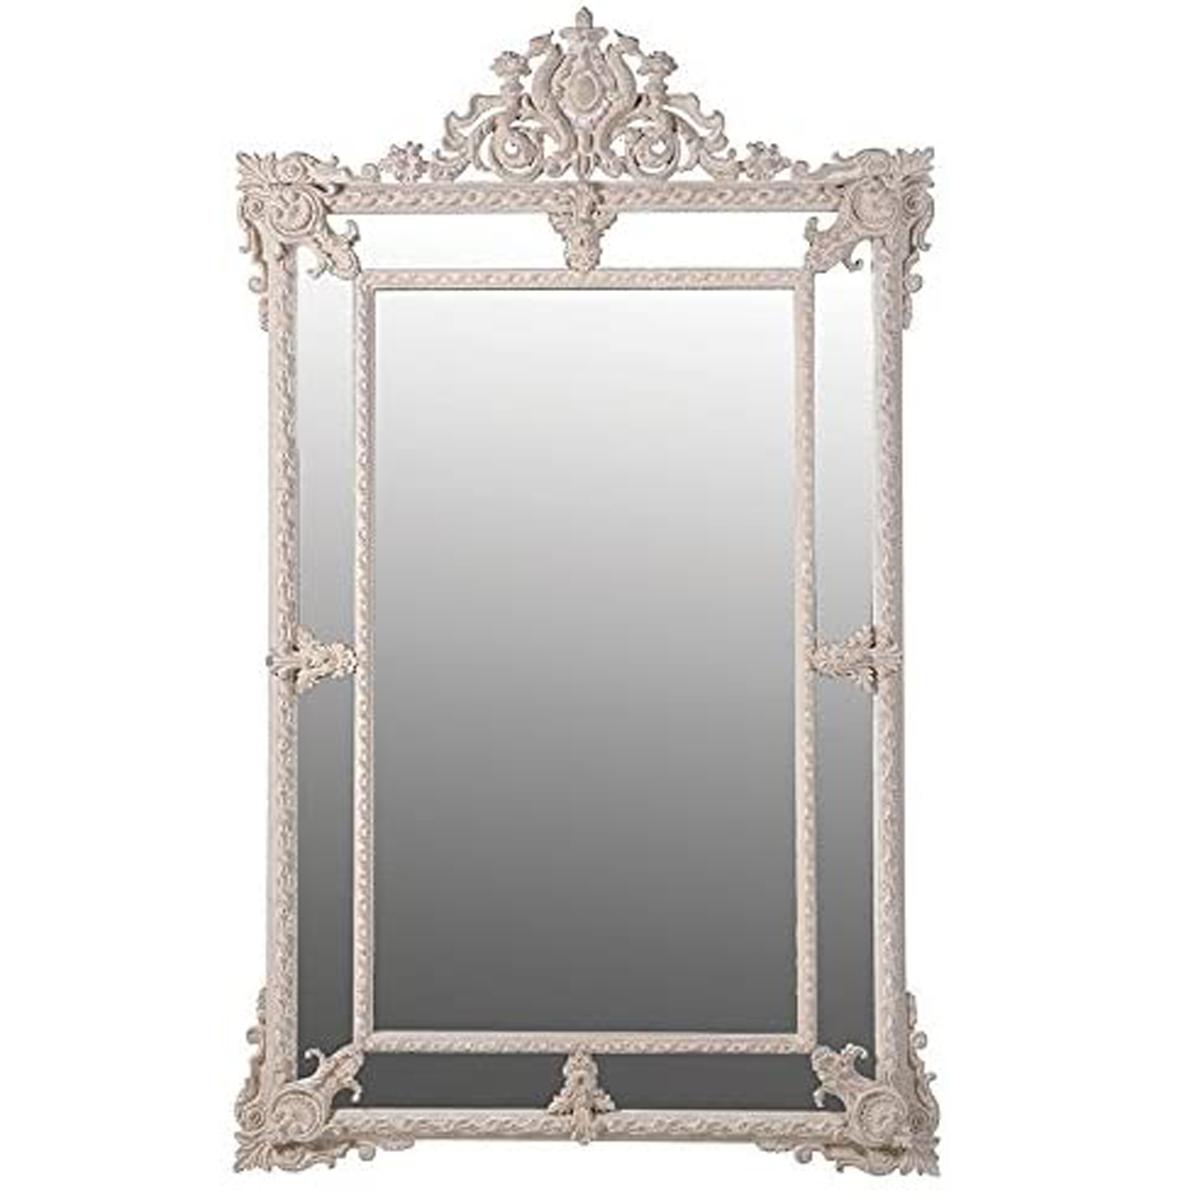 Large Antique Traditional Style Cream Mirror Interior Flair